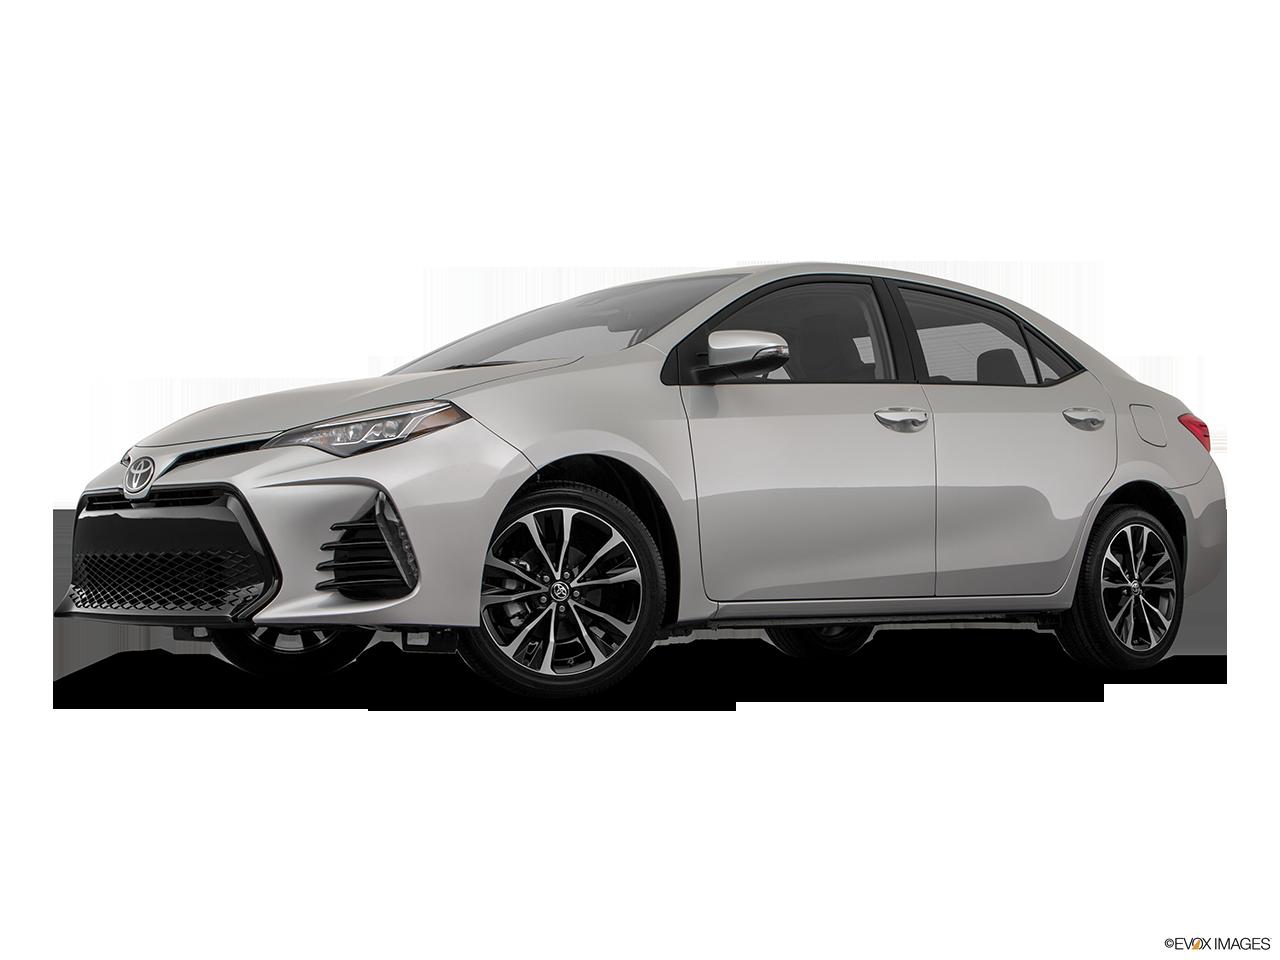 2019 Toyota Corolla photo